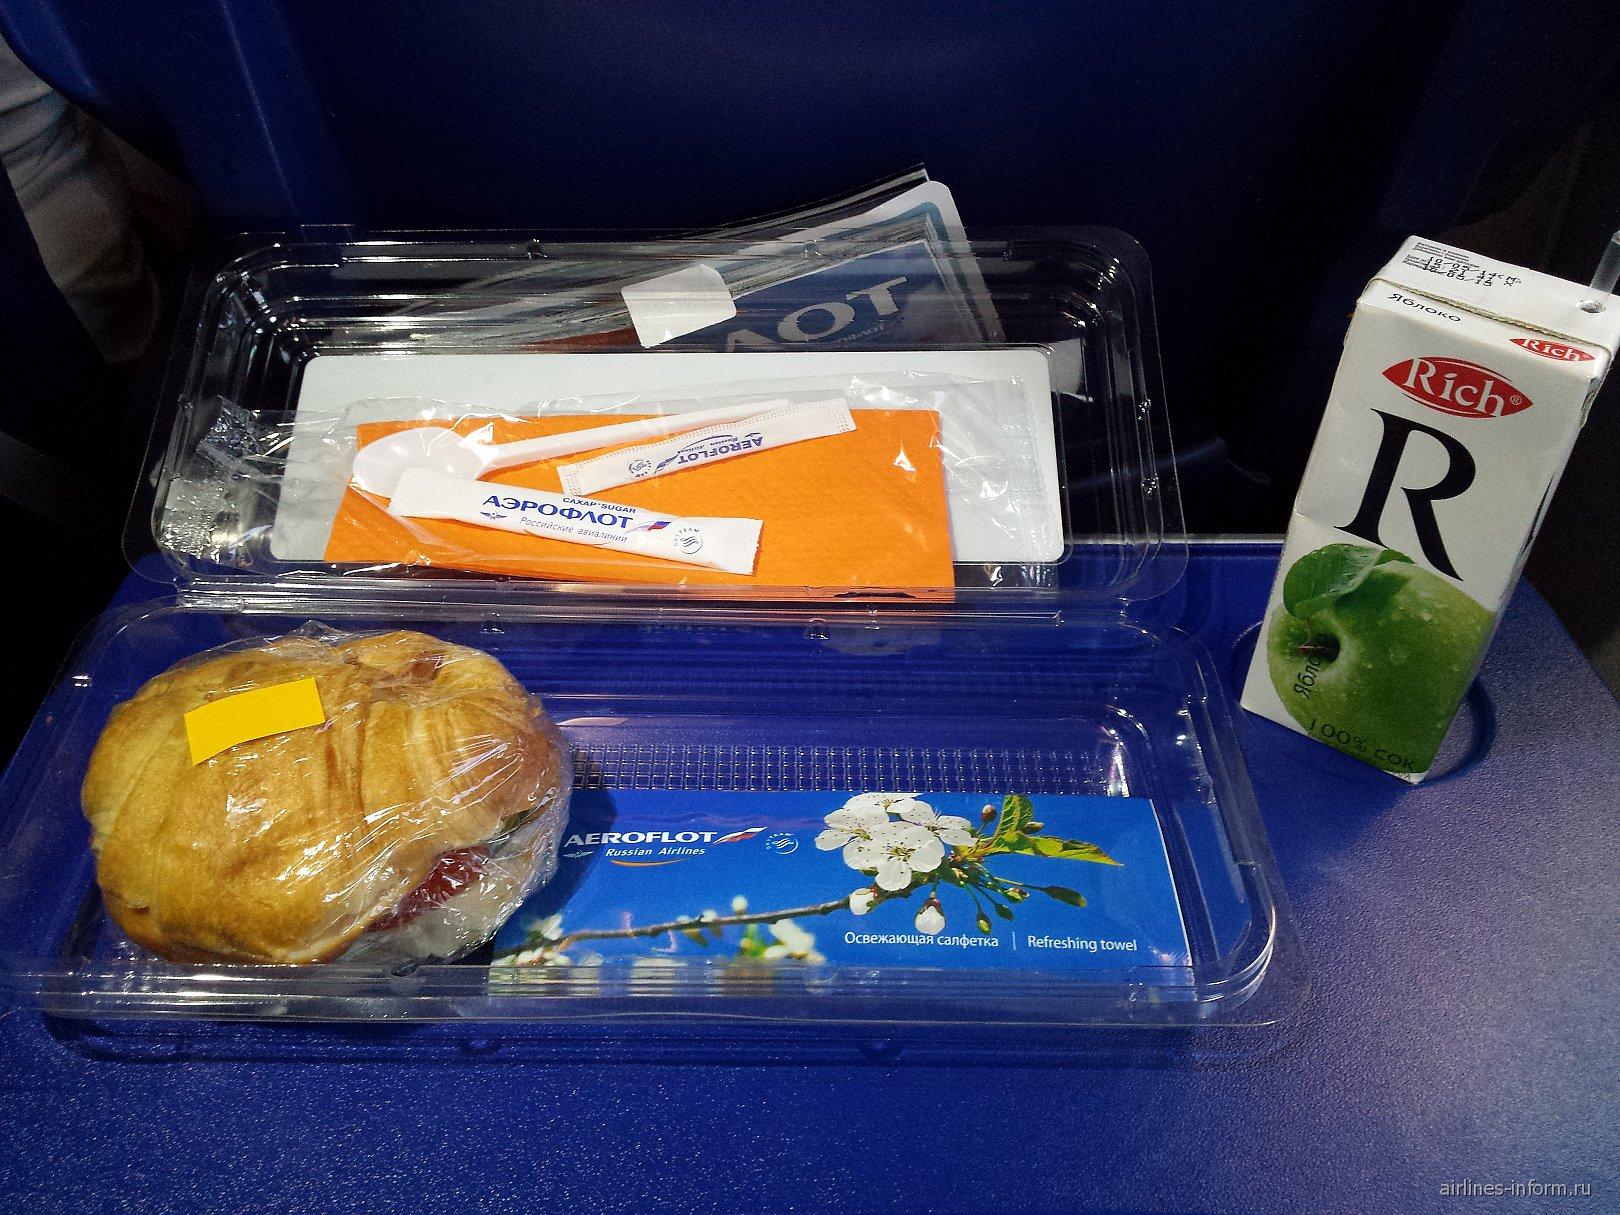 Питание на рейсе Аэрофлота Санкт-Петербург-Москва